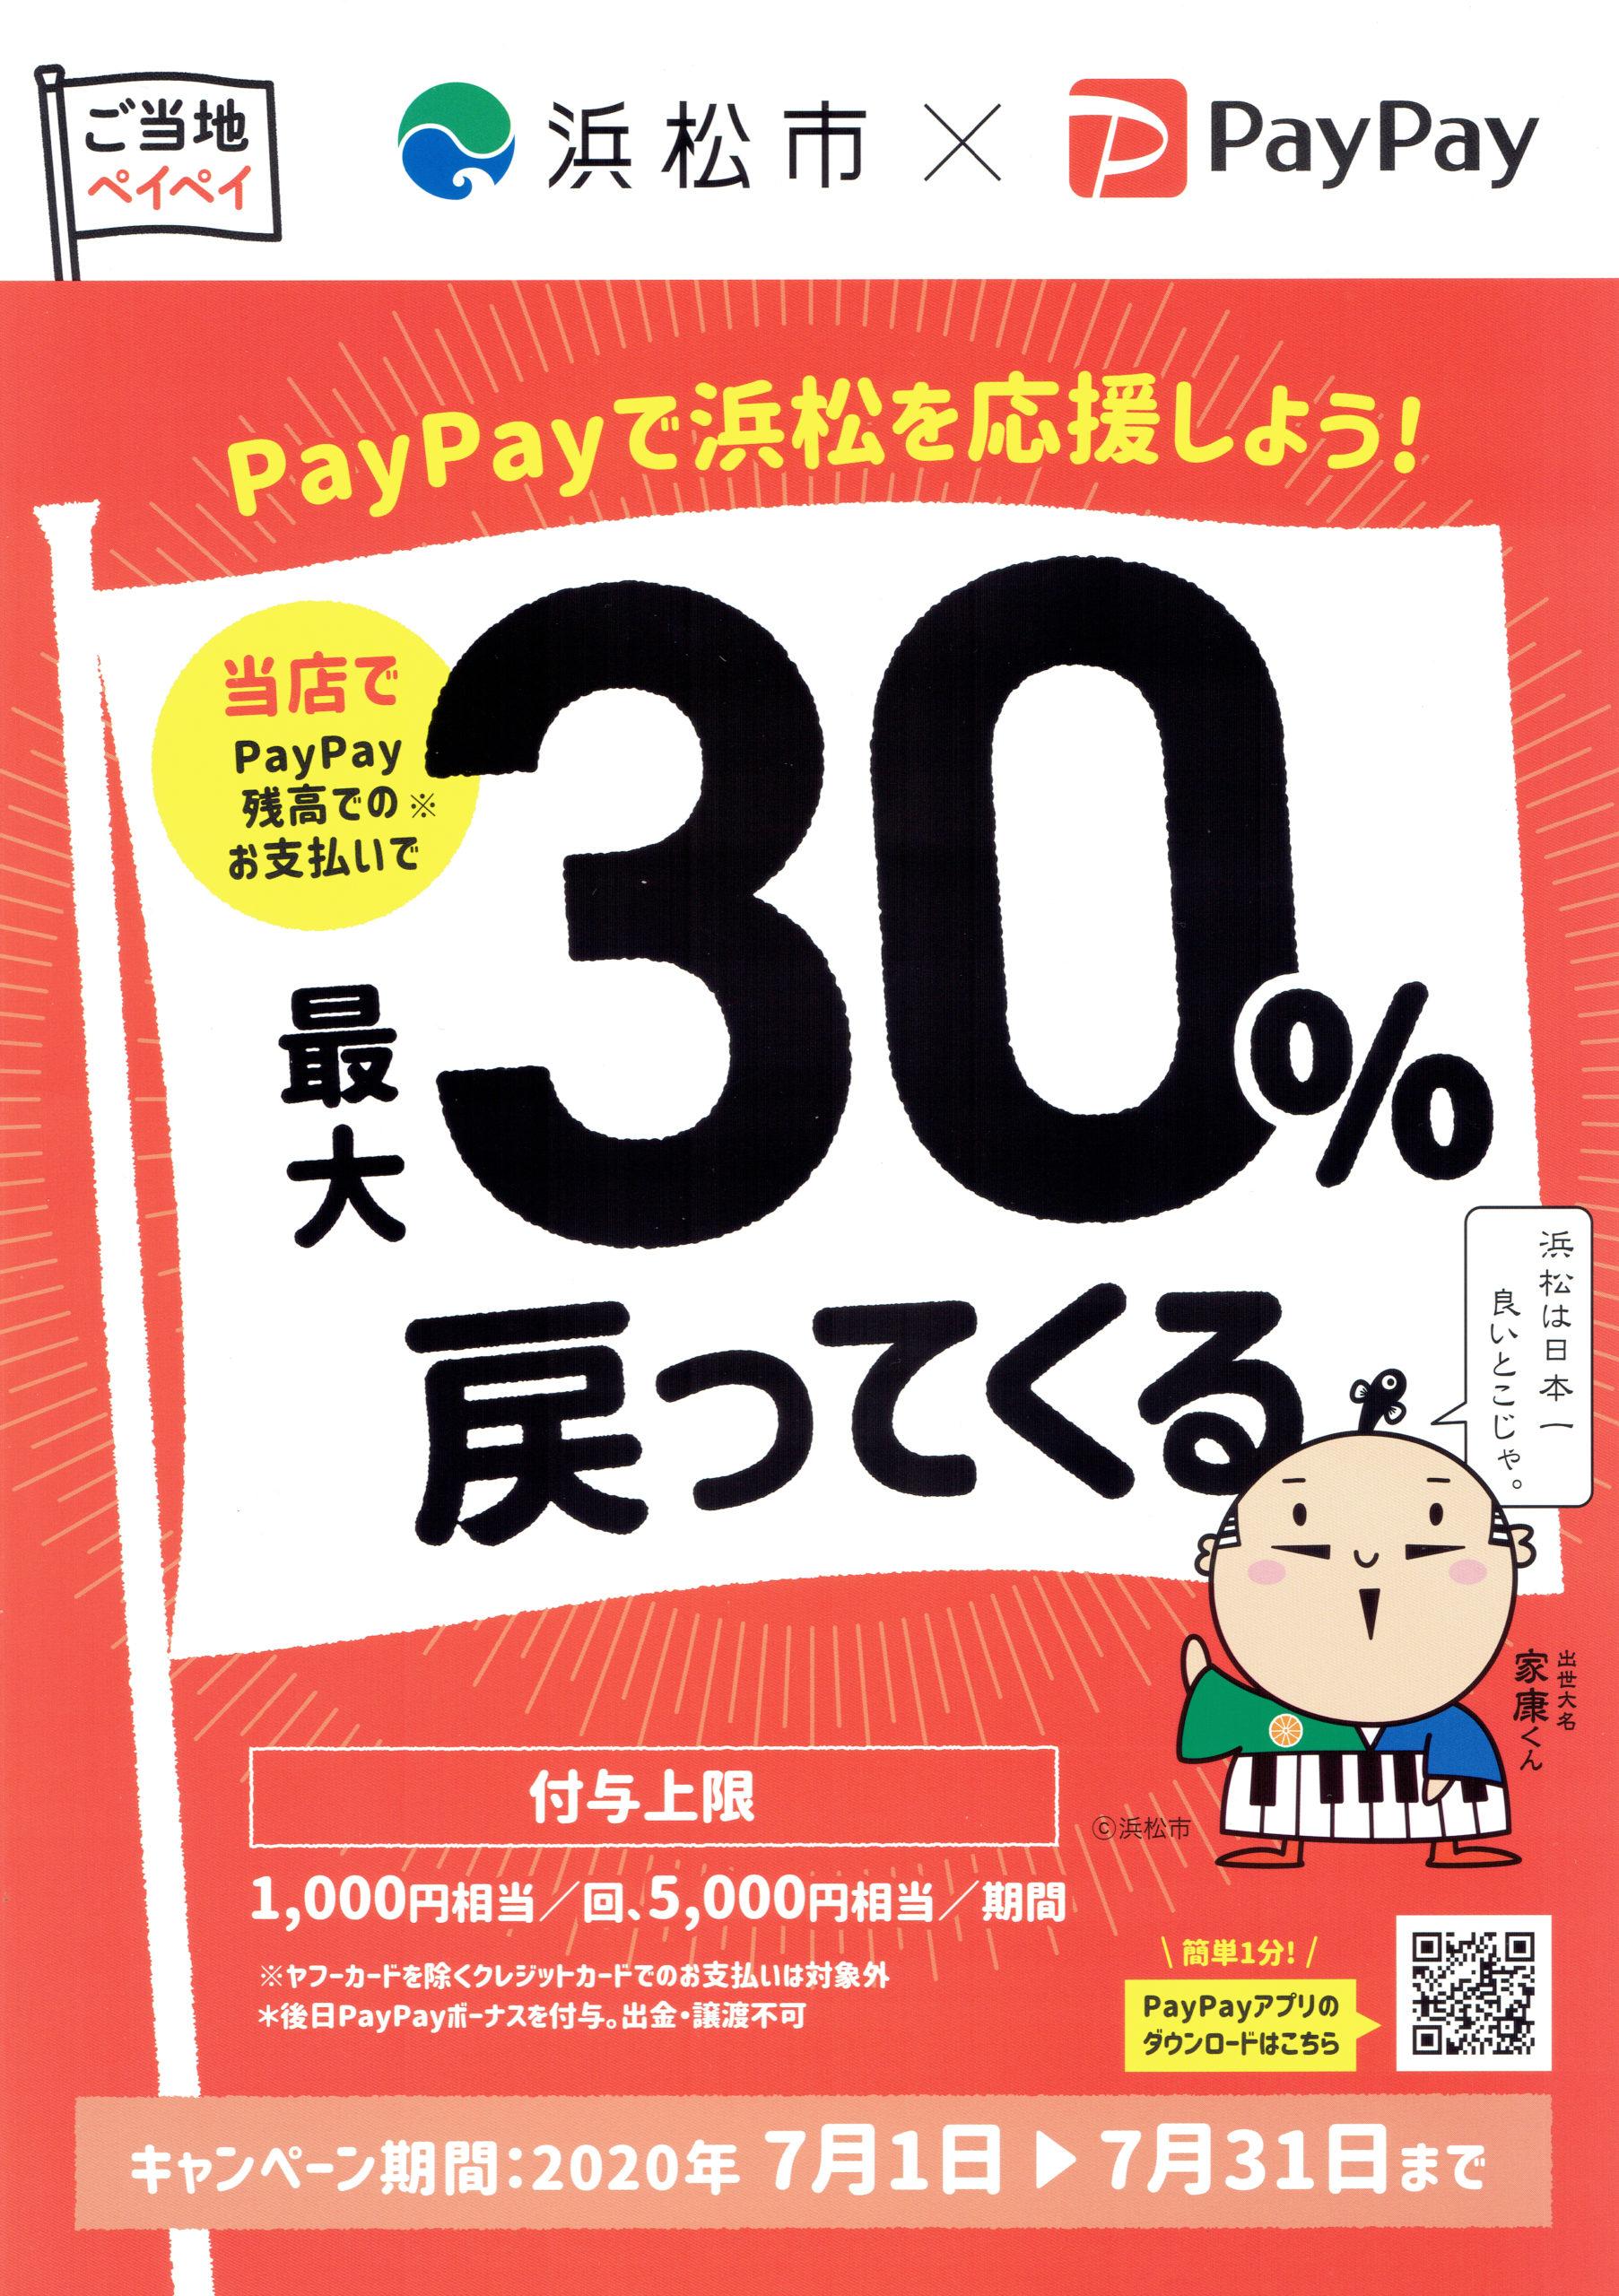 PayPayで浜松を応援しよう!ご当地ペイペイ浜松市×PayPay30%バックキャンペーン開催。美容室ル・レーヴ船越店も対象店舗です!